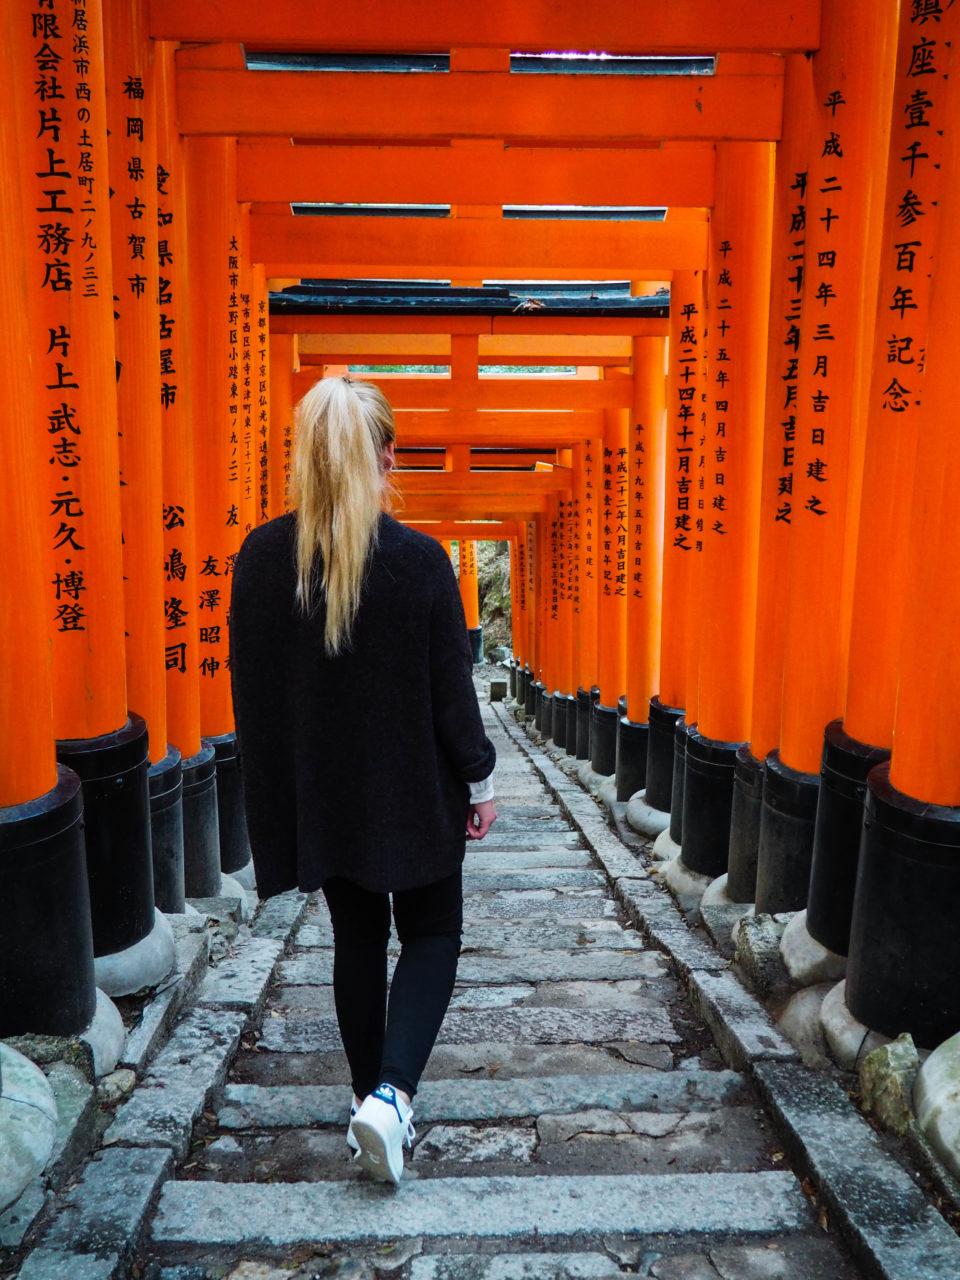 Japan-Kyoto-Fushimi-Inari